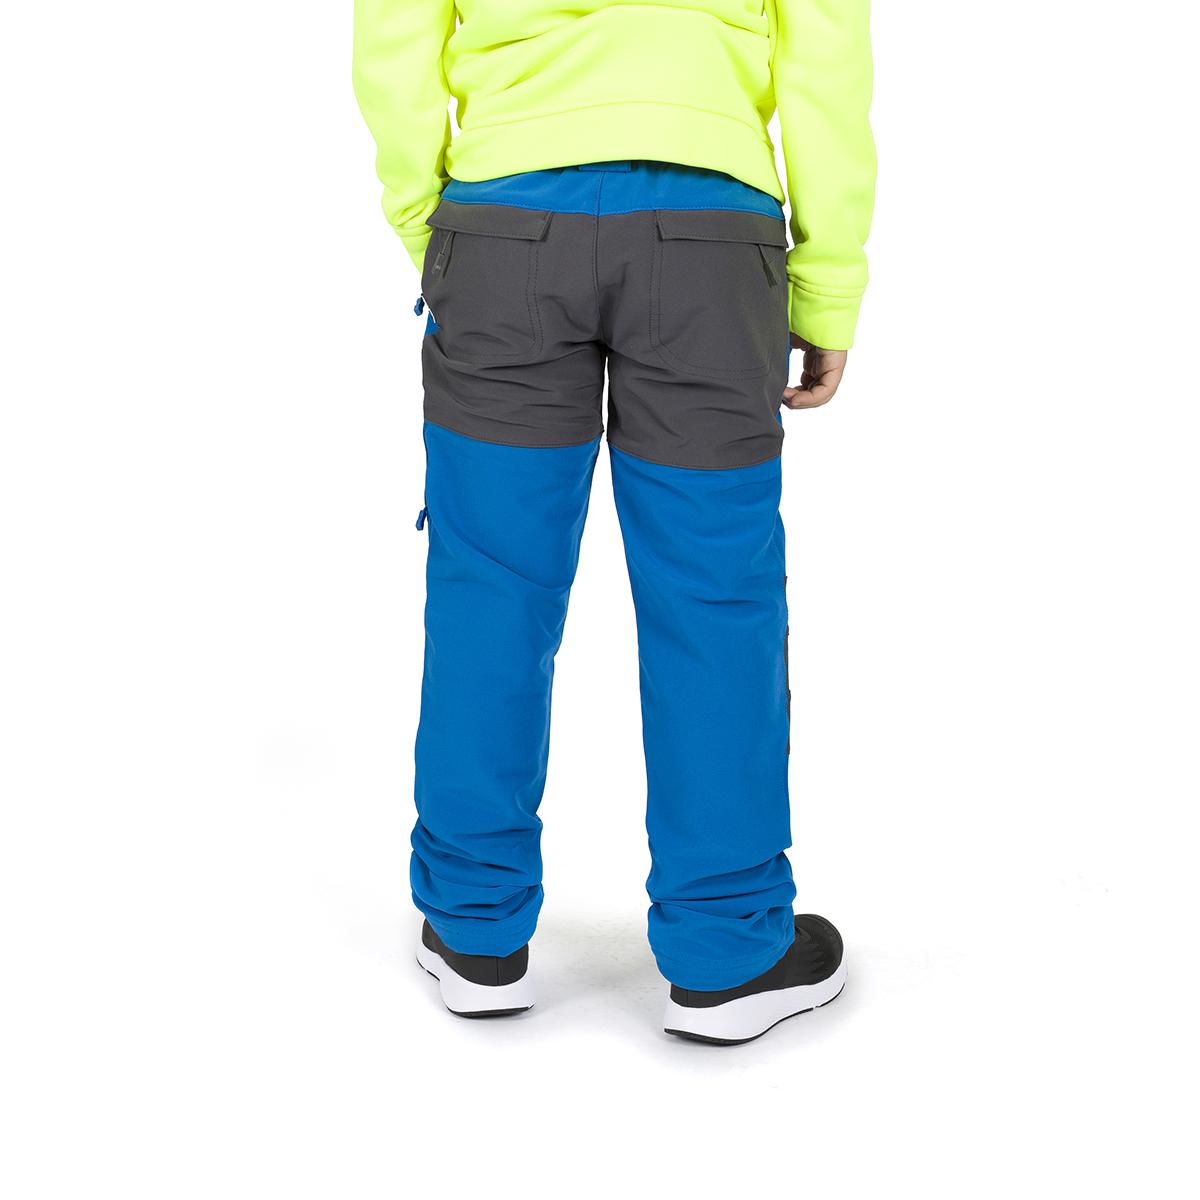 CHAMONIX KIDS STRETCH PANT BLUE